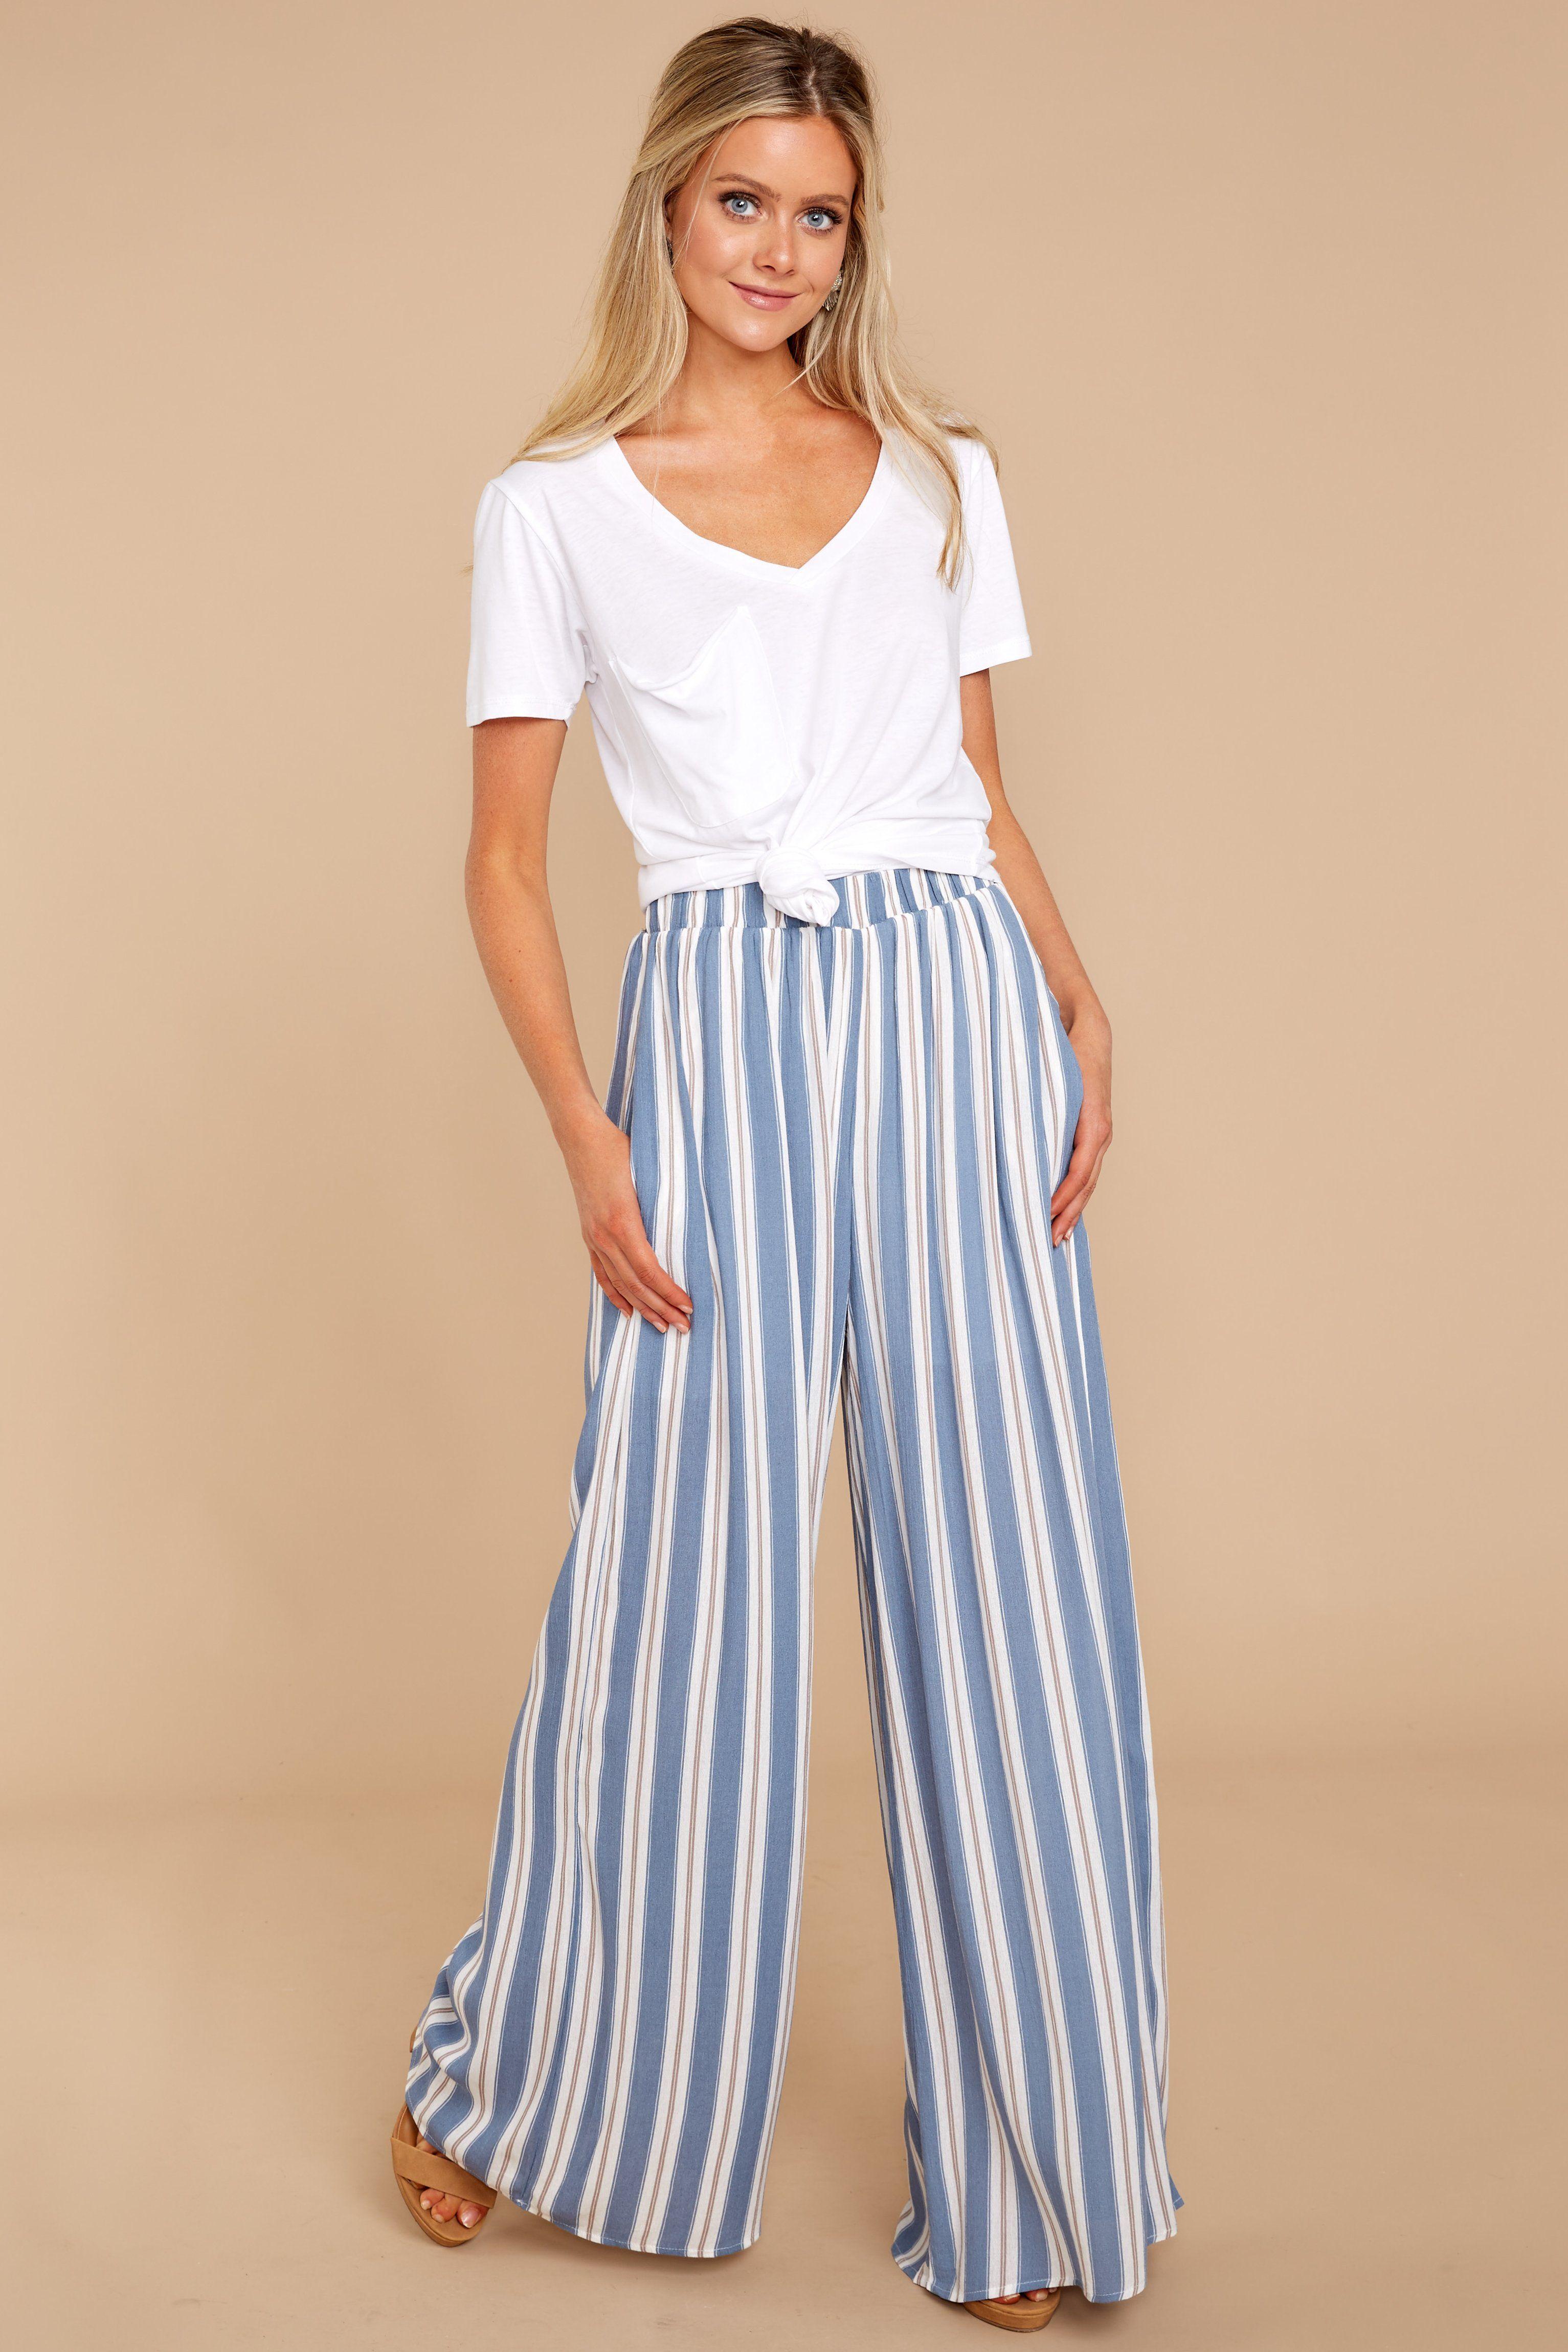 2018 Summer New Women Elastic Waist Tie Chic Vertical Wide Leg Casual Pants Products Hot Sale Bottoms Pants & Capris